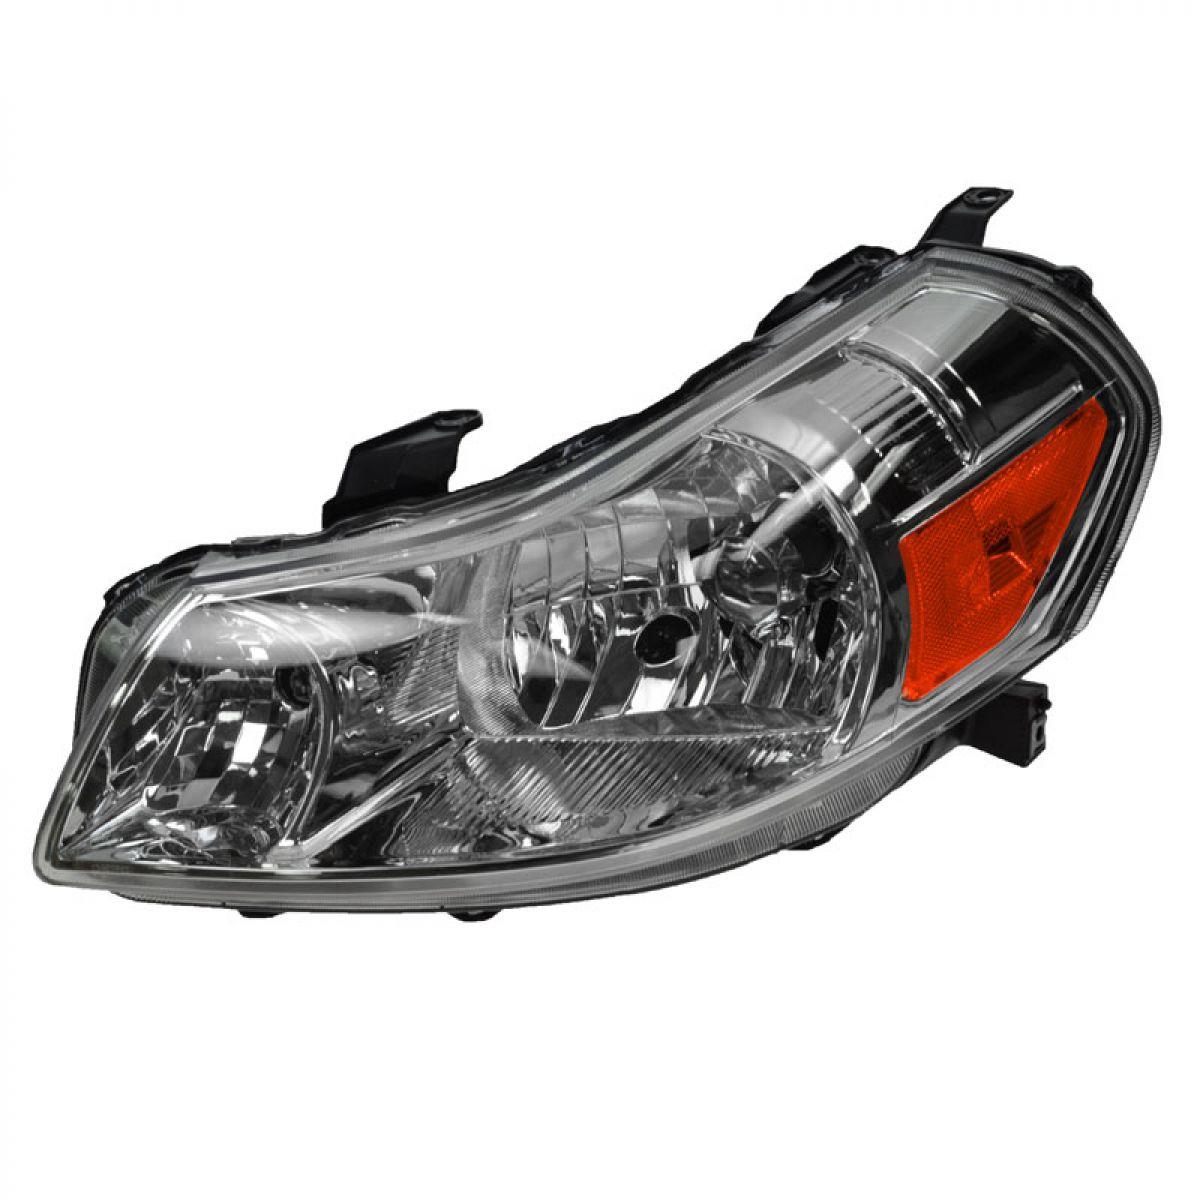 Suzuki Sx Headlight Bulb Replacement